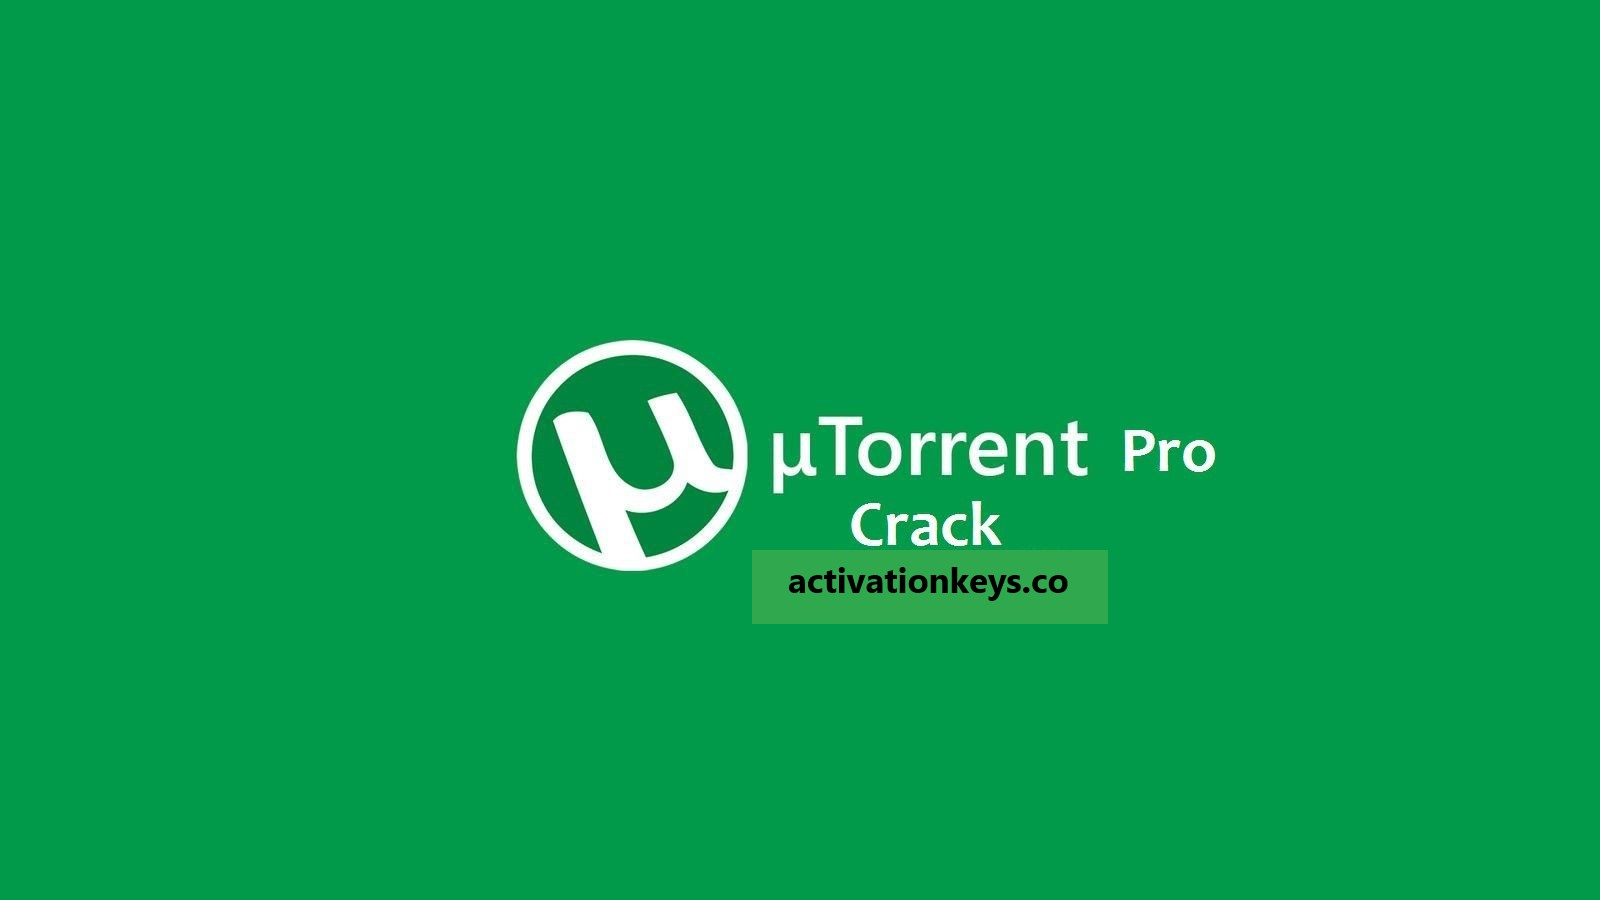 Utorrent Pro Crack 3.5.5 Build 45770 + Activation Key Free Download [2020]